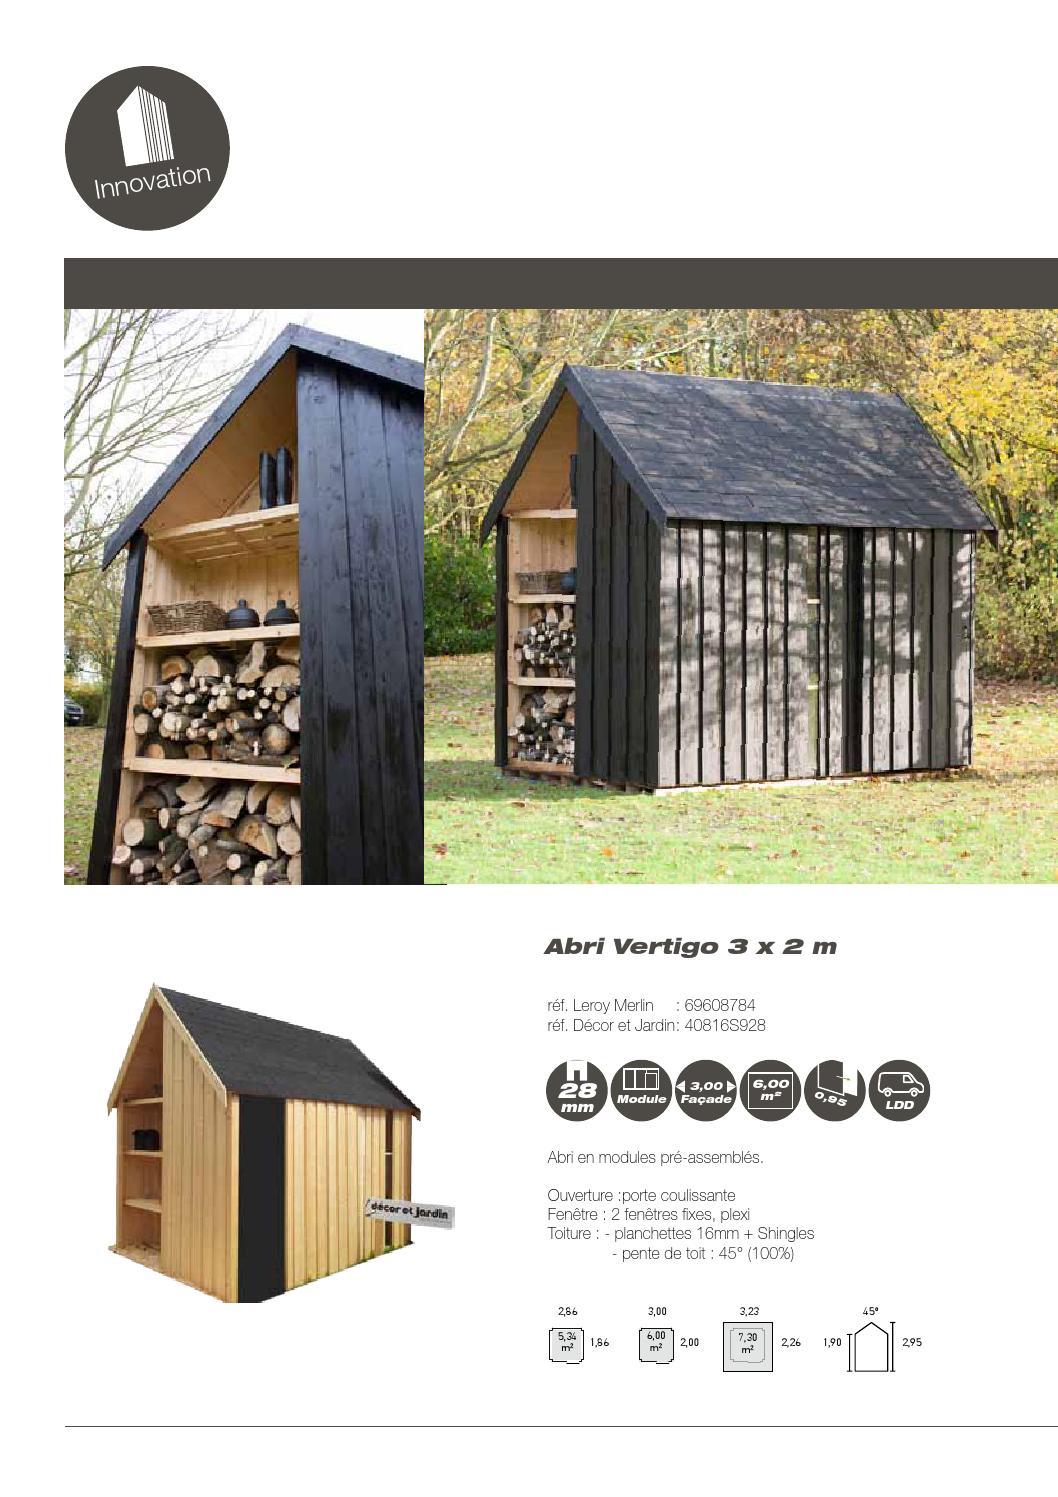 Décor Et Jardin Catalogue Leroy Merlin By Cras Woodgroup - Issuu tout Porte De Jardin Leroy Merlin